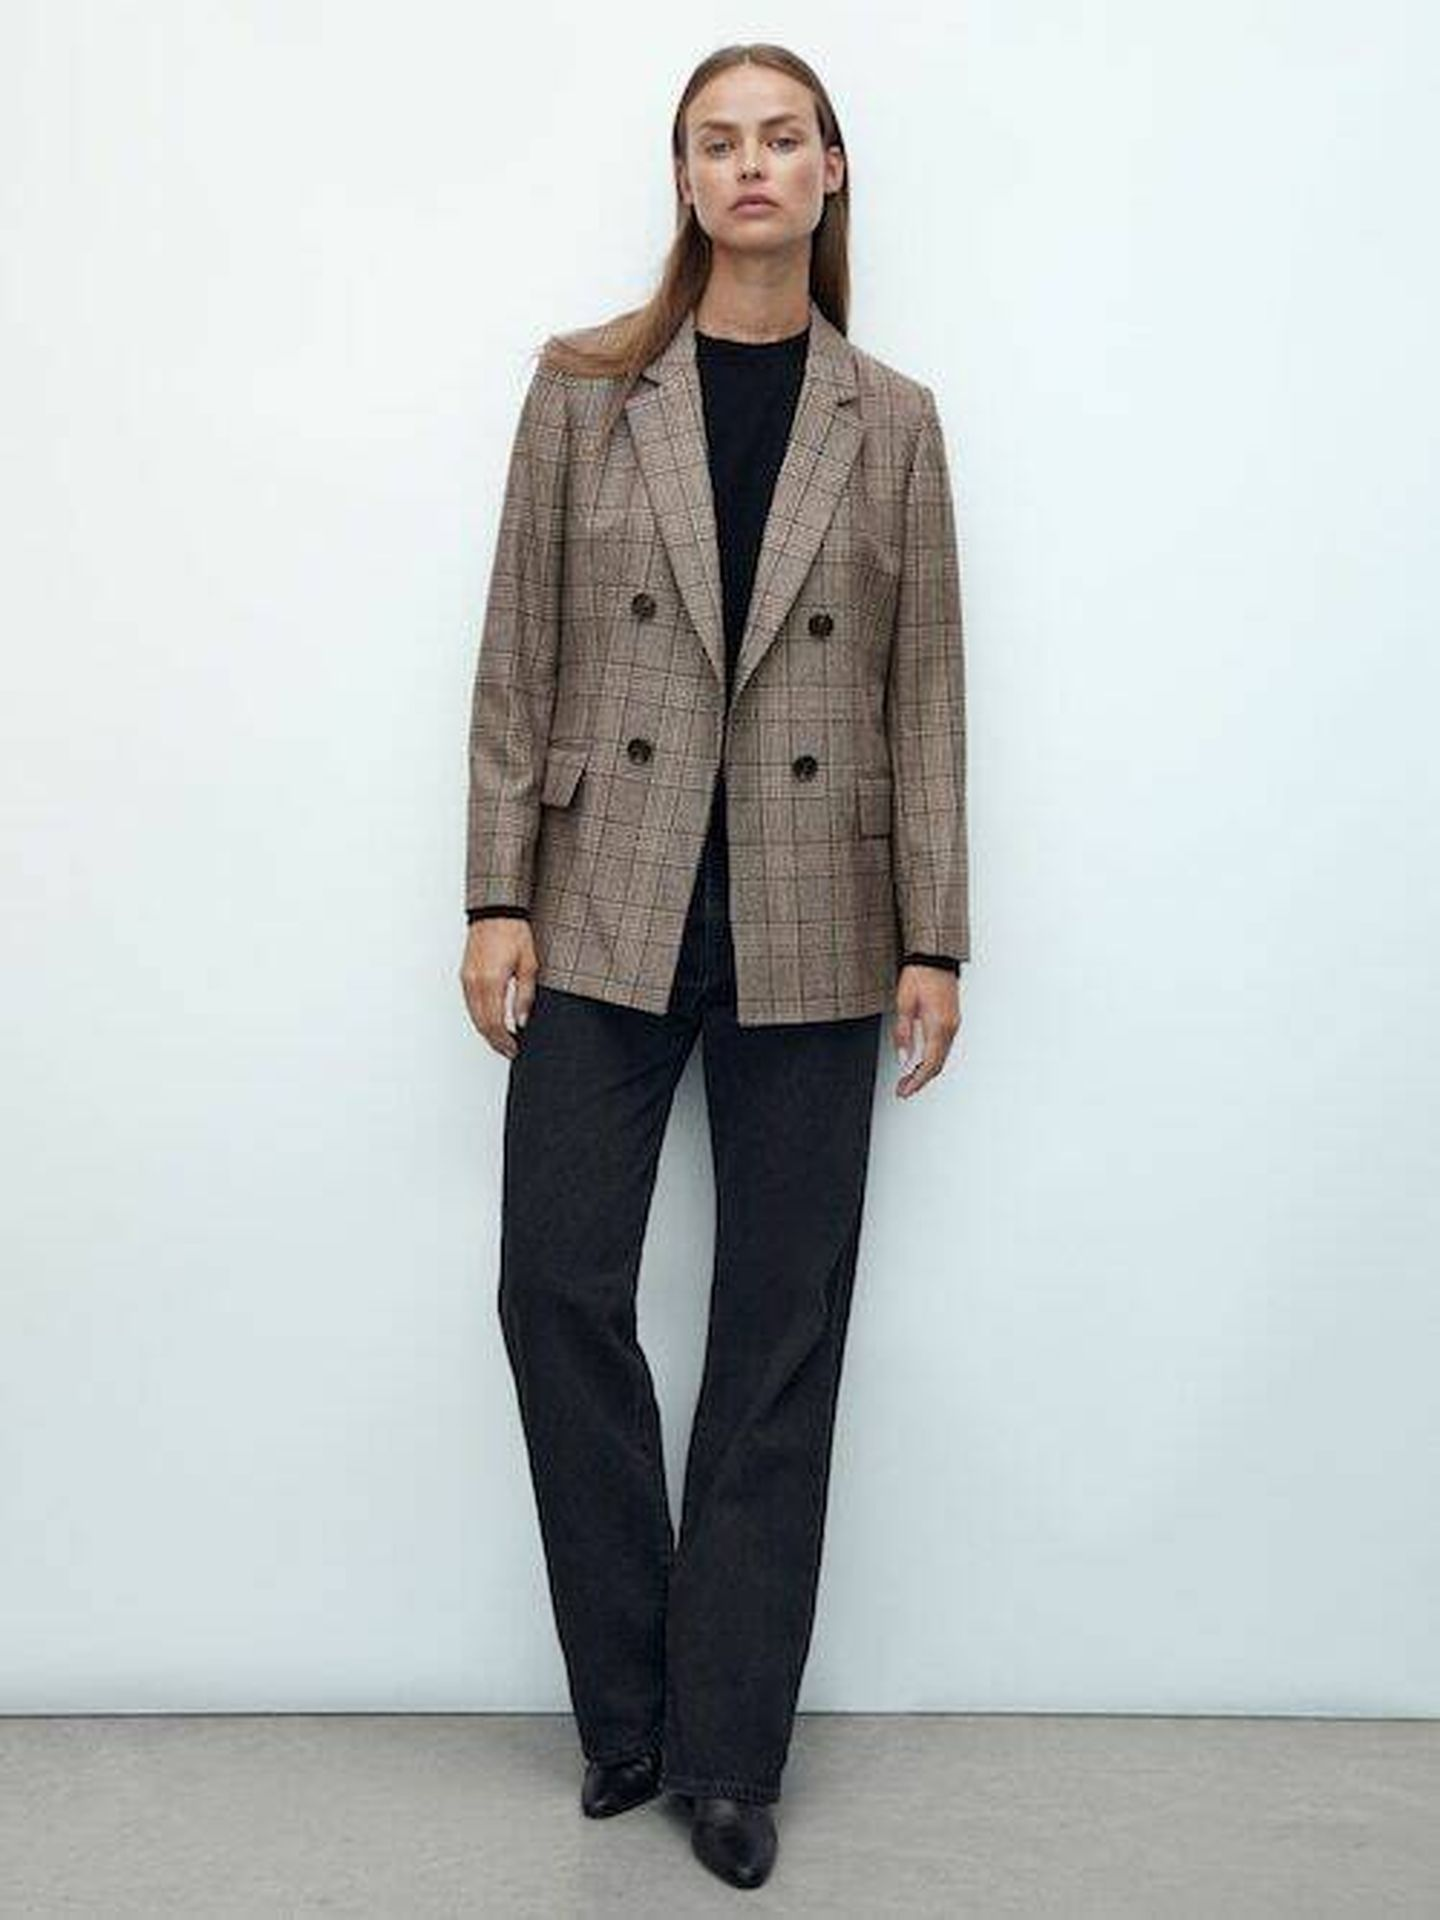 La elegante blazer de cuadros de Massimo Dutti. (Cortesía)